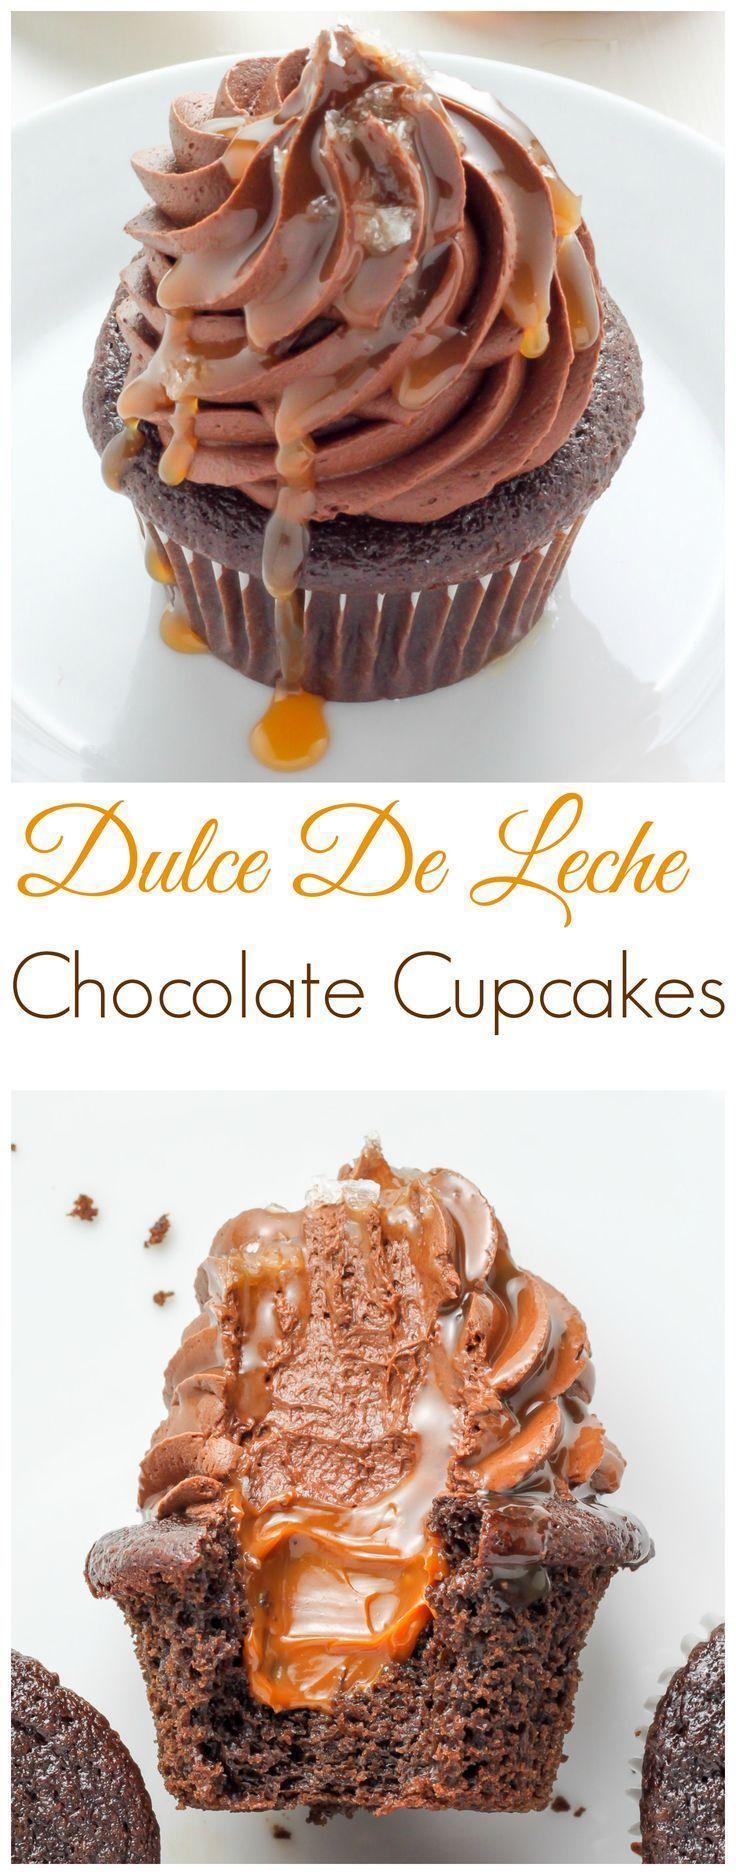 Best 25+ Chocolate cupcakes ideas on Pinterest | Cupcake recipes ...